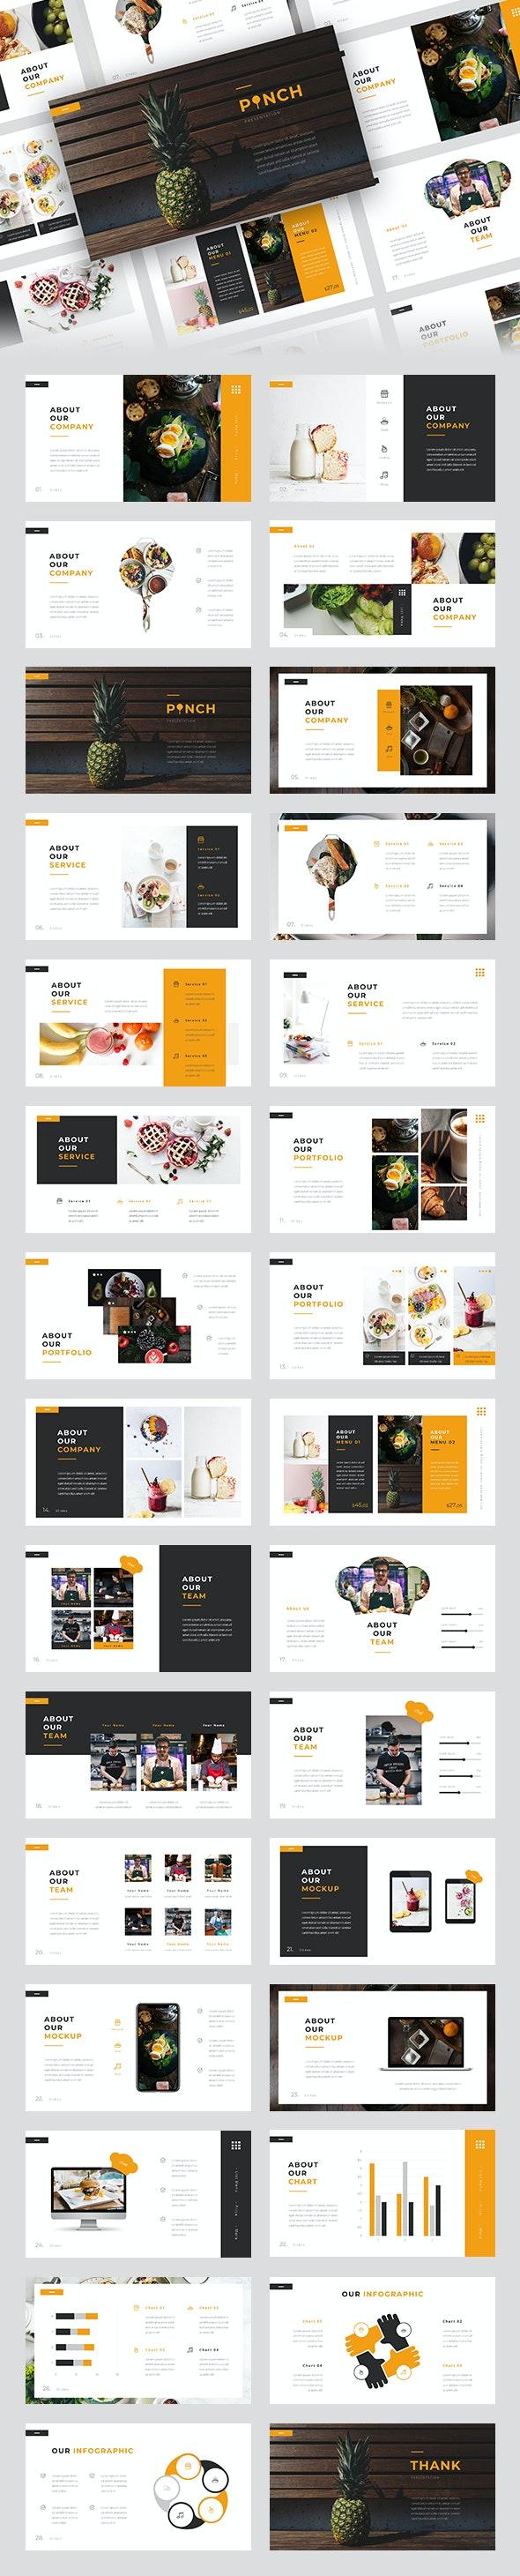 Pinch - Food Keynote Template - Business Keynote Templates